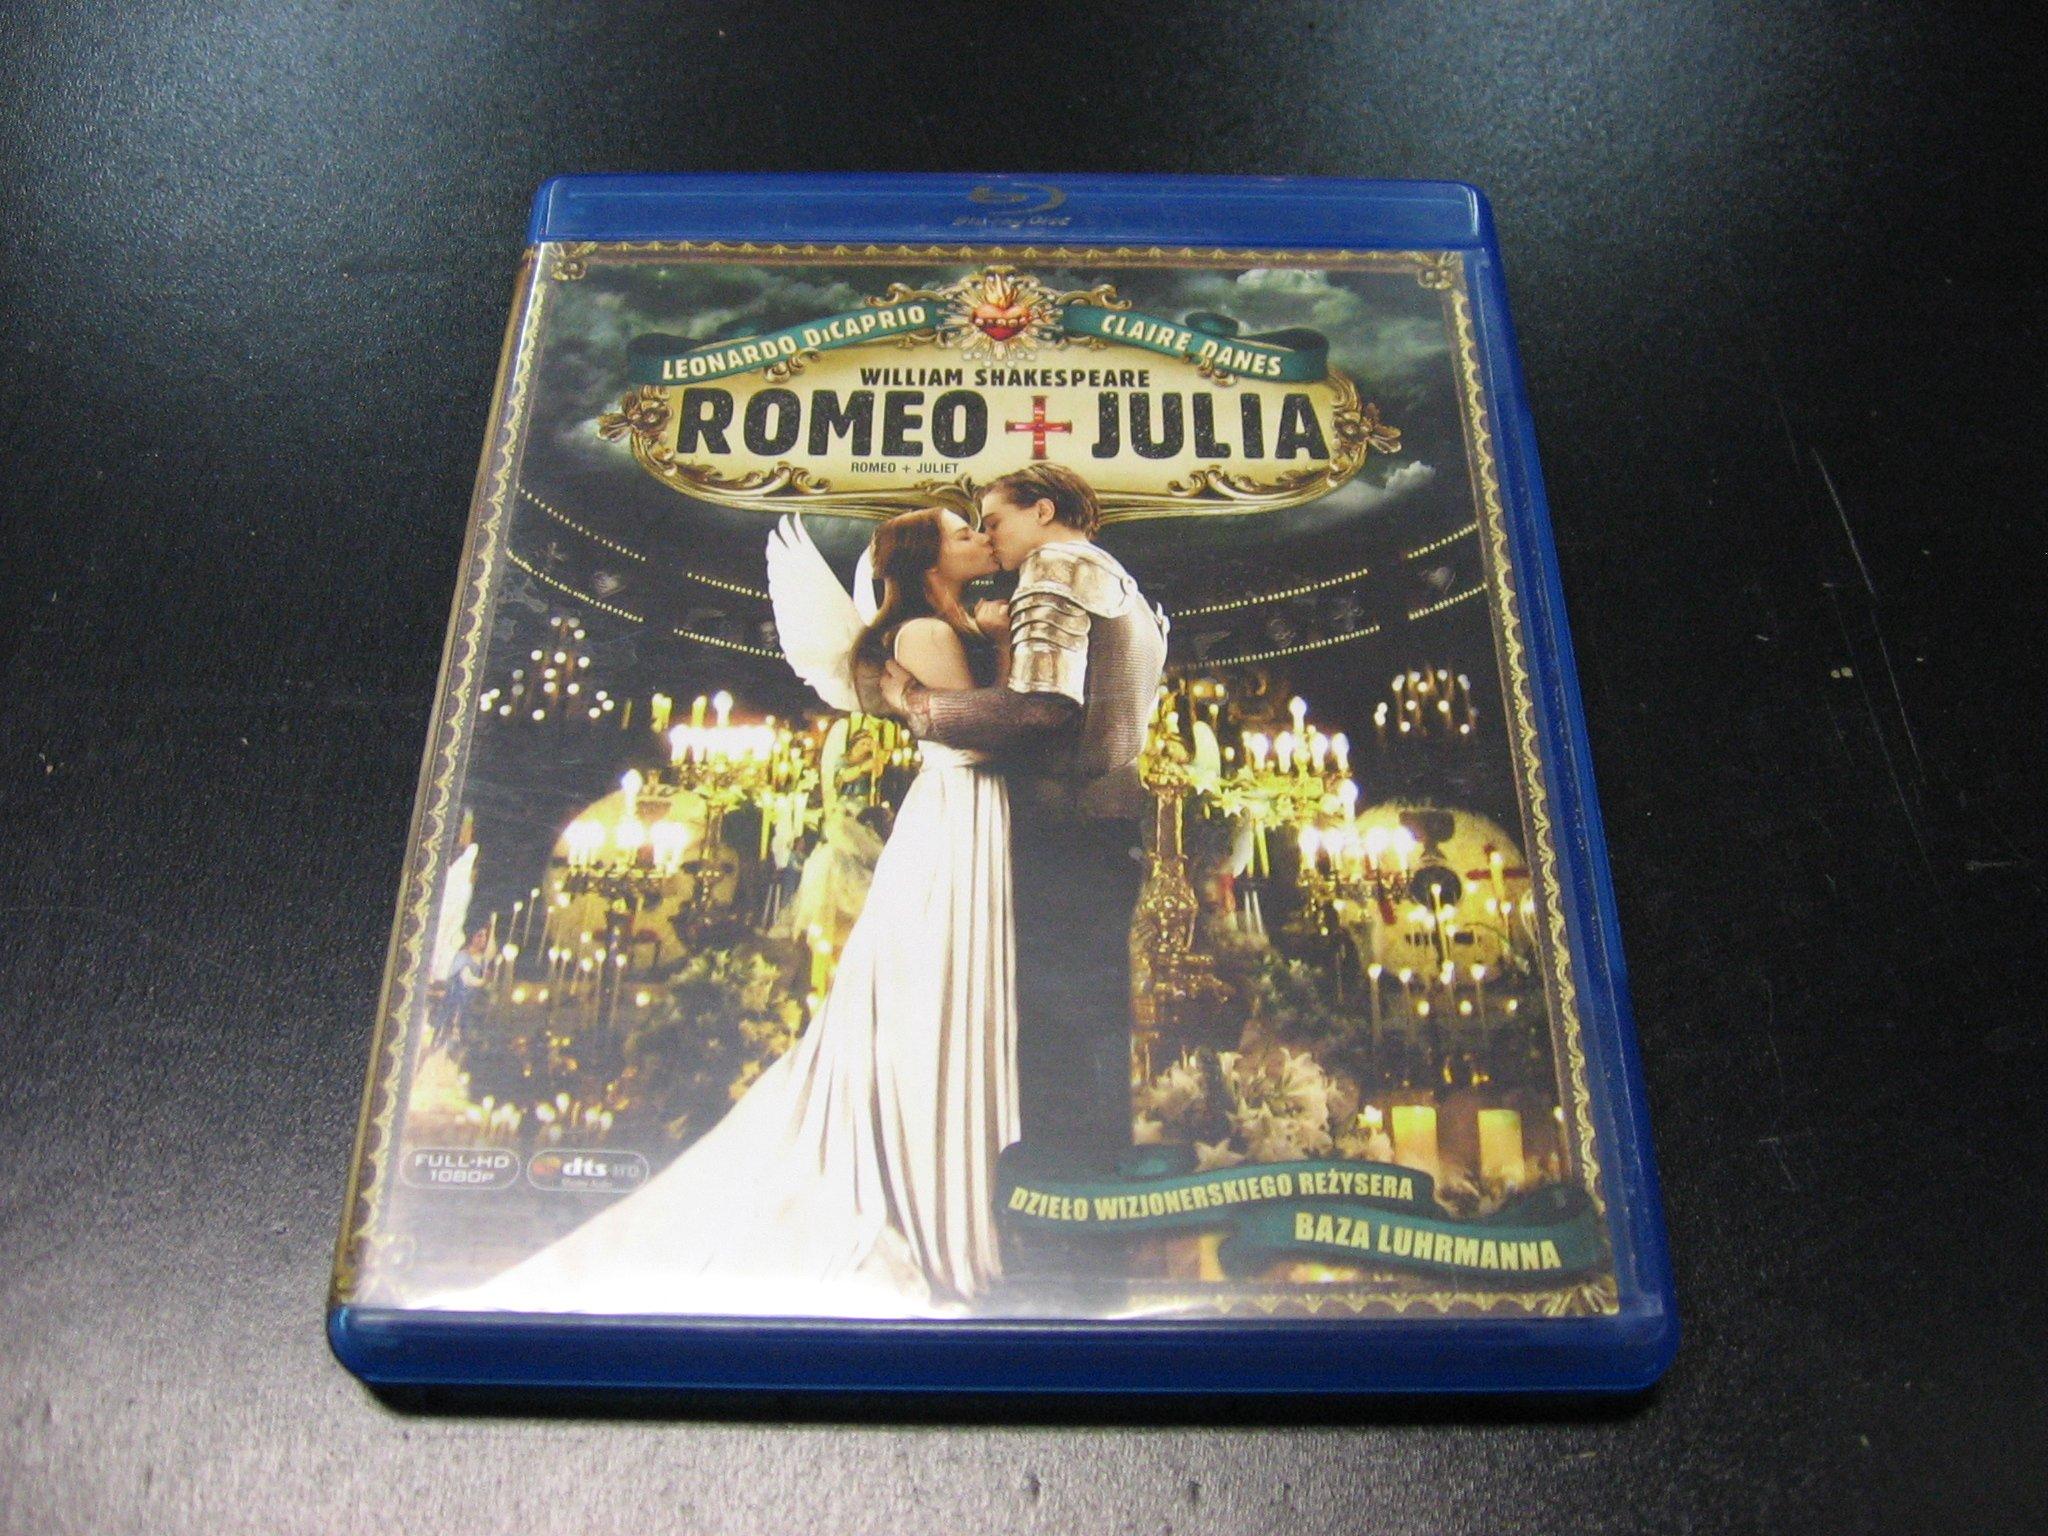 ROMEO I JULIA 035 `````````` Blu-rey ```````````` Opole